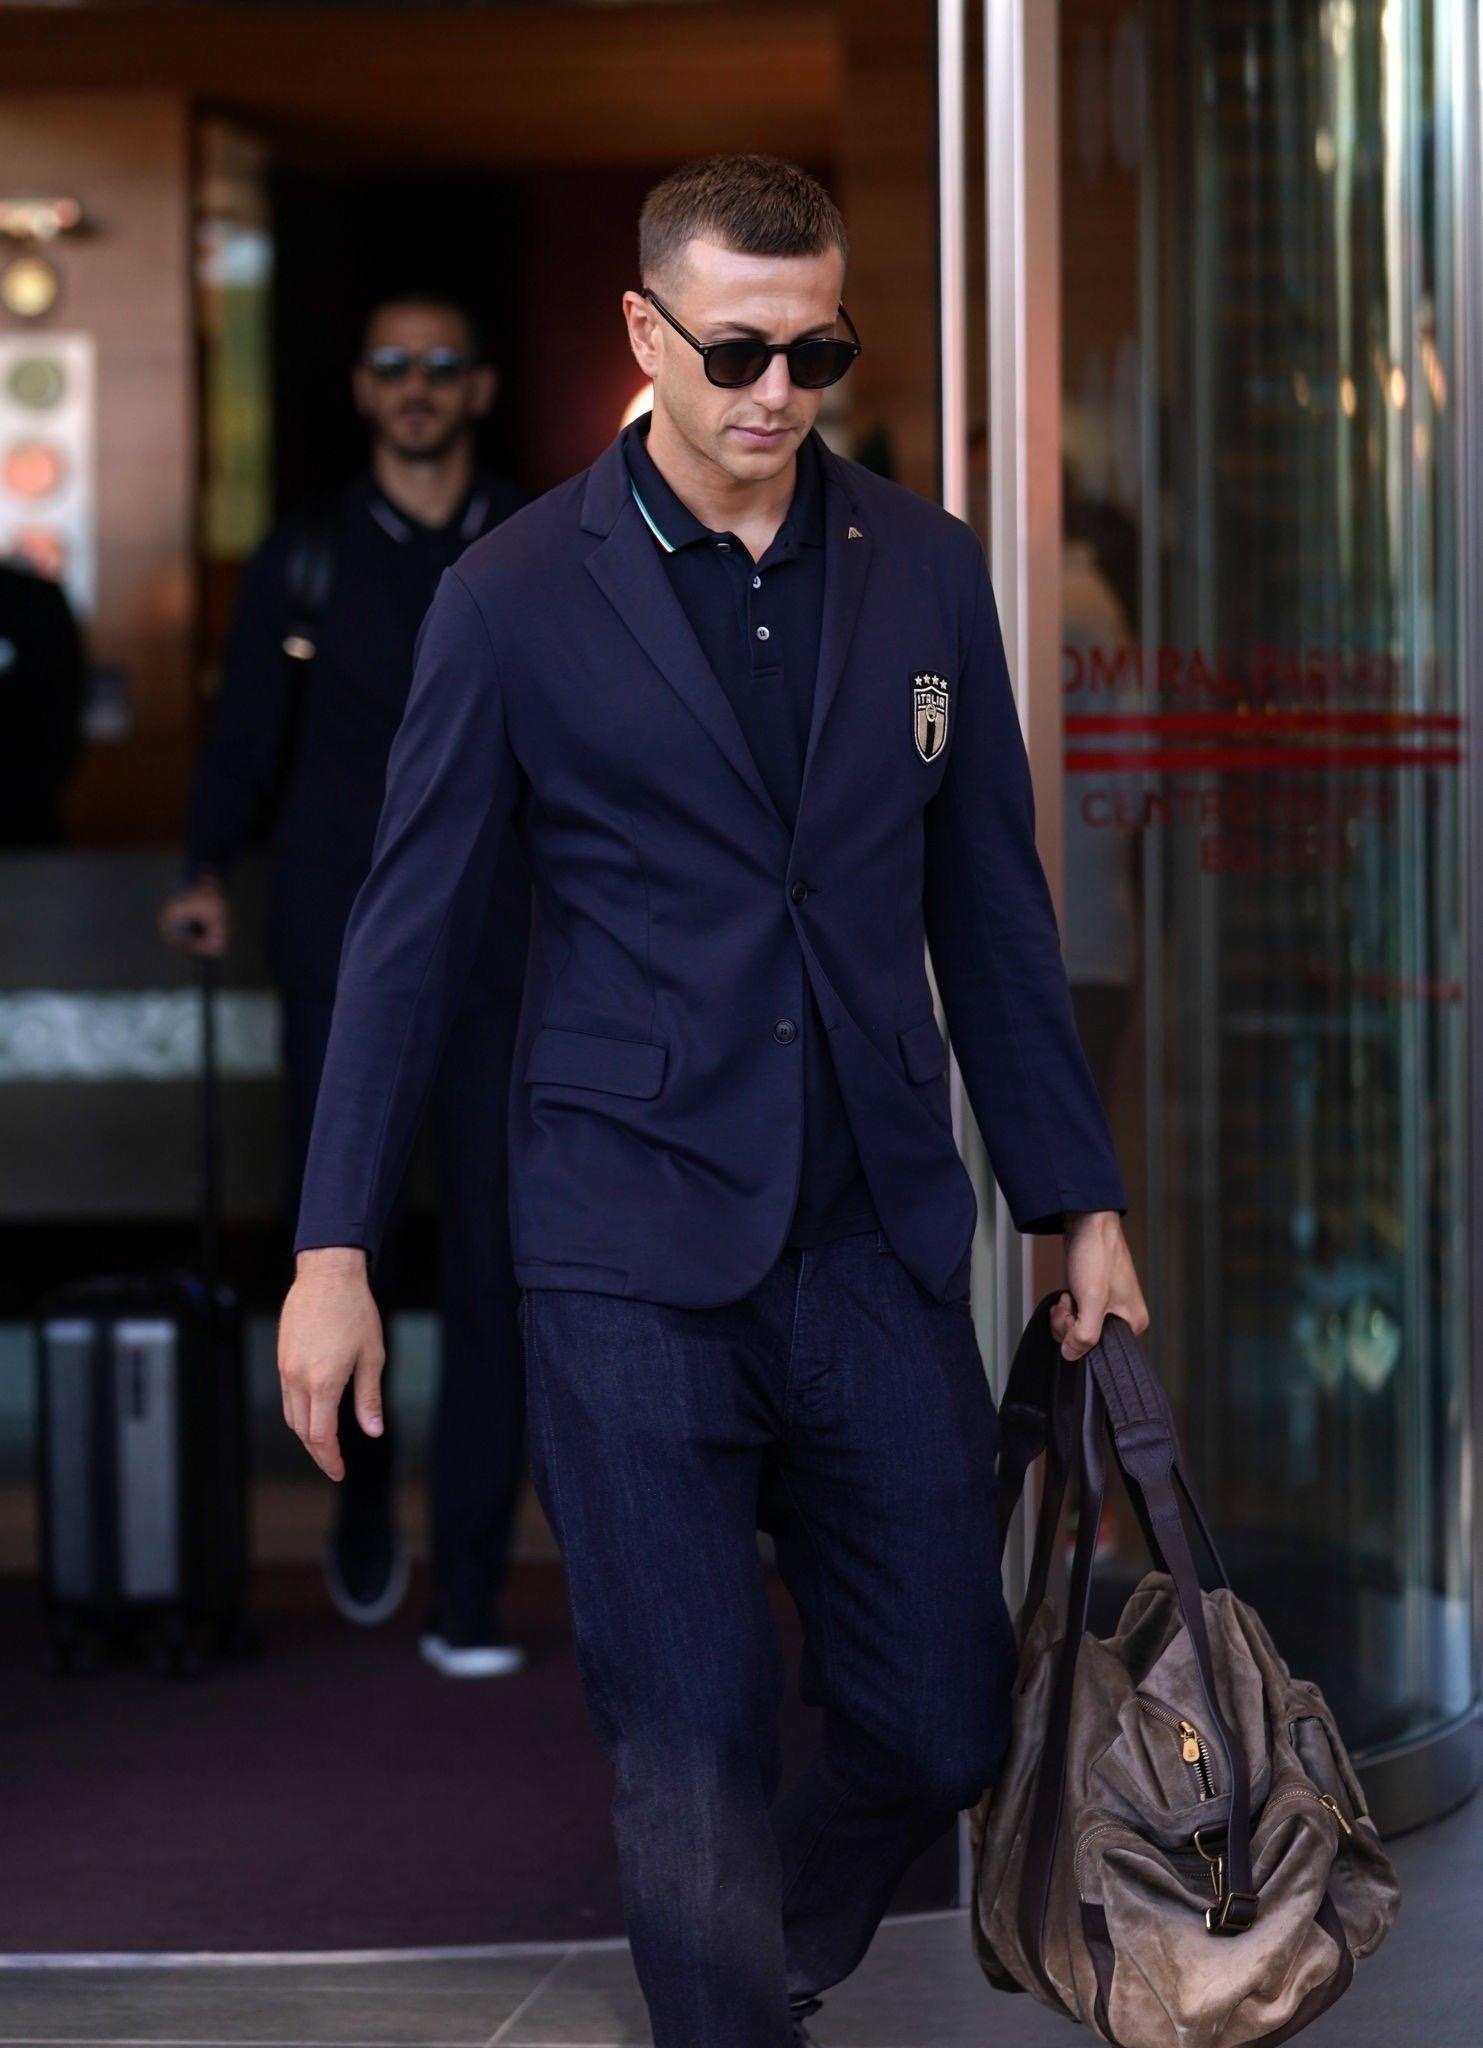 Vestito Elegante Juventus.Federico Bernardeschi 04 09 19 Juventus Azzurri Calcio Fede